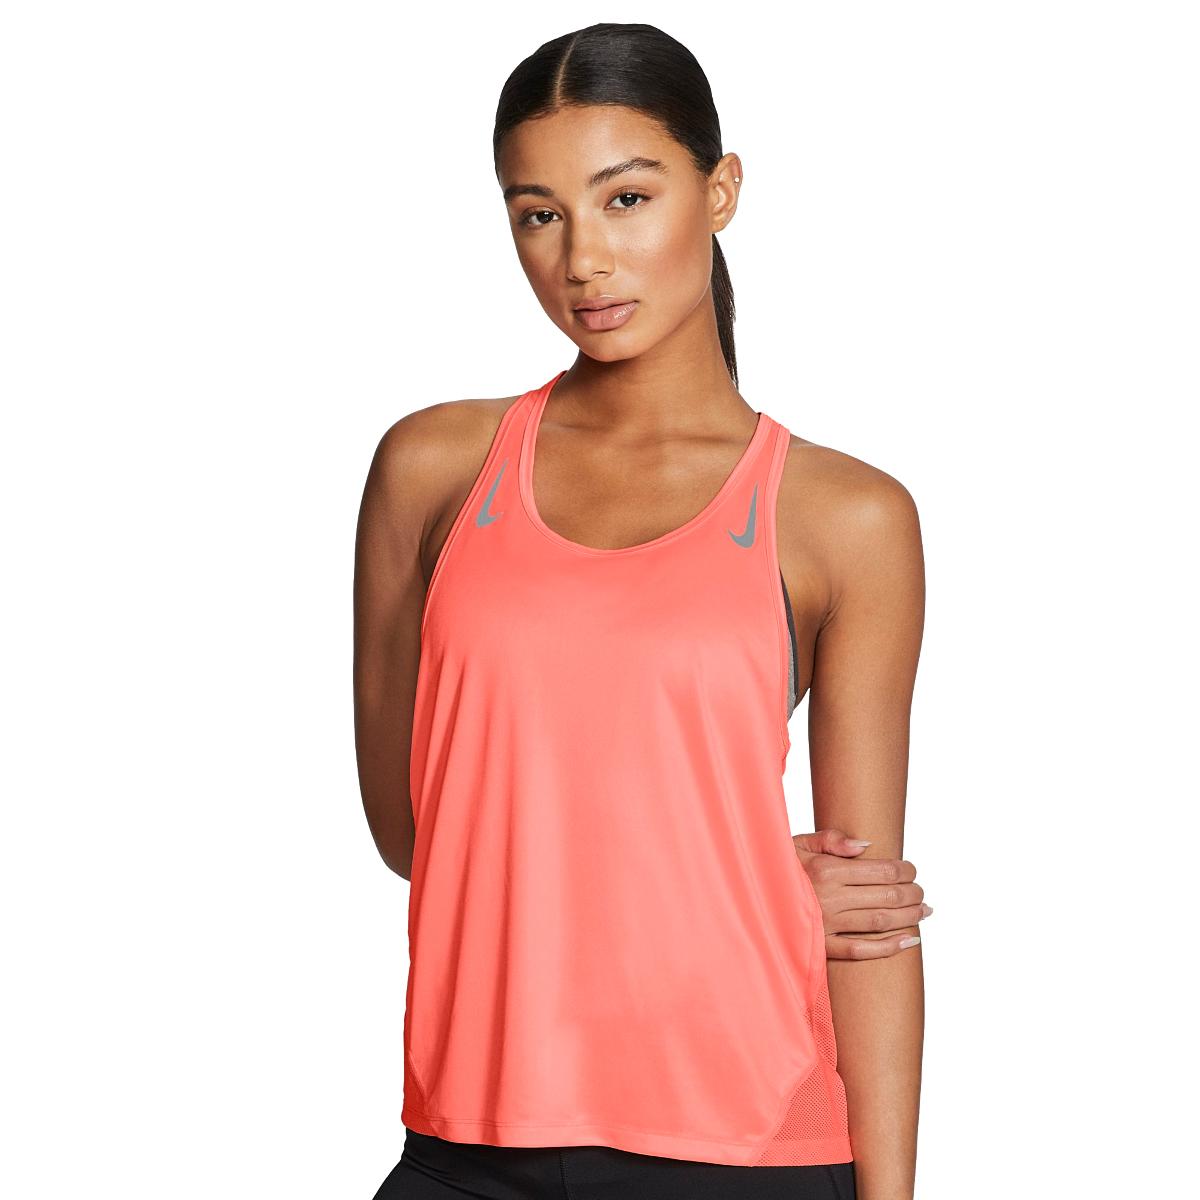 Women's Nike Miler Women's Running Singlet - Color: Bright Mango/Reflective - Size: L, Bright Mango/Reflective, large, image 3